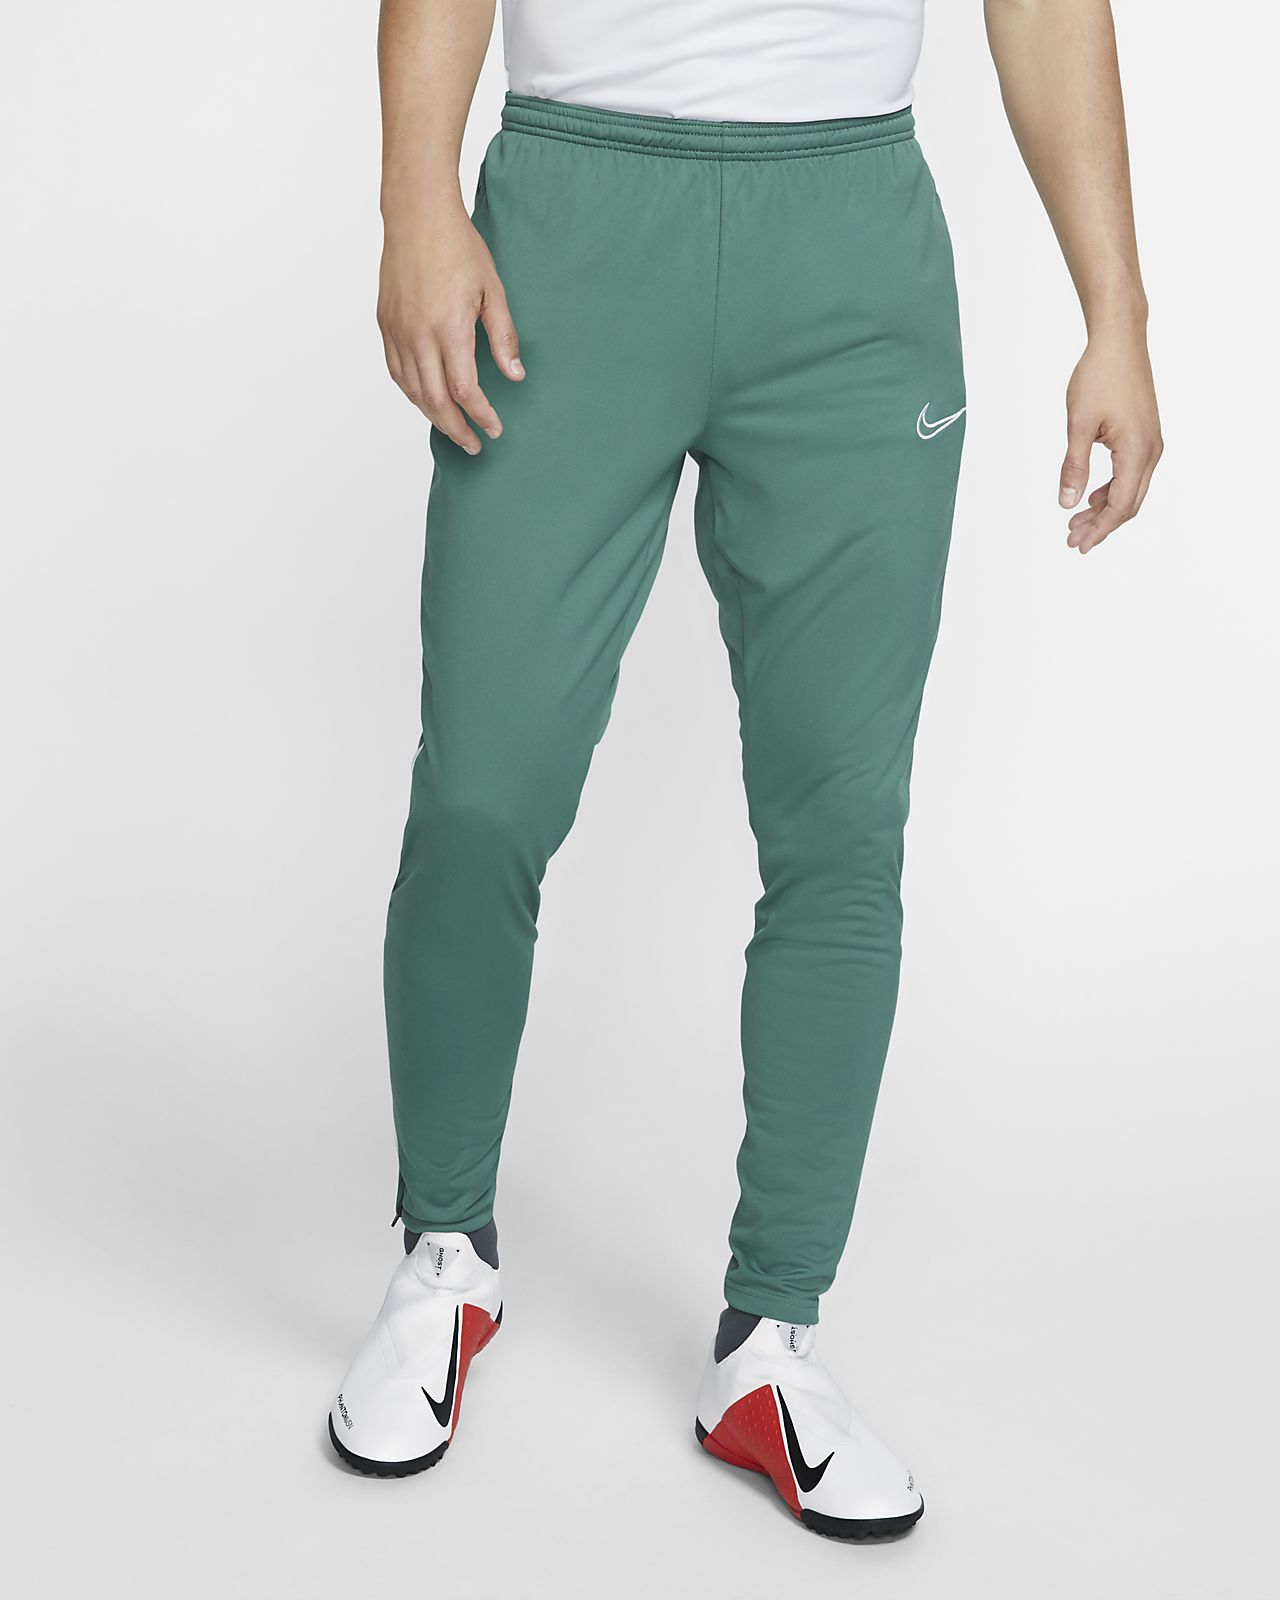 Nike Dri-FIT Academy-fodboldbukser til mænd